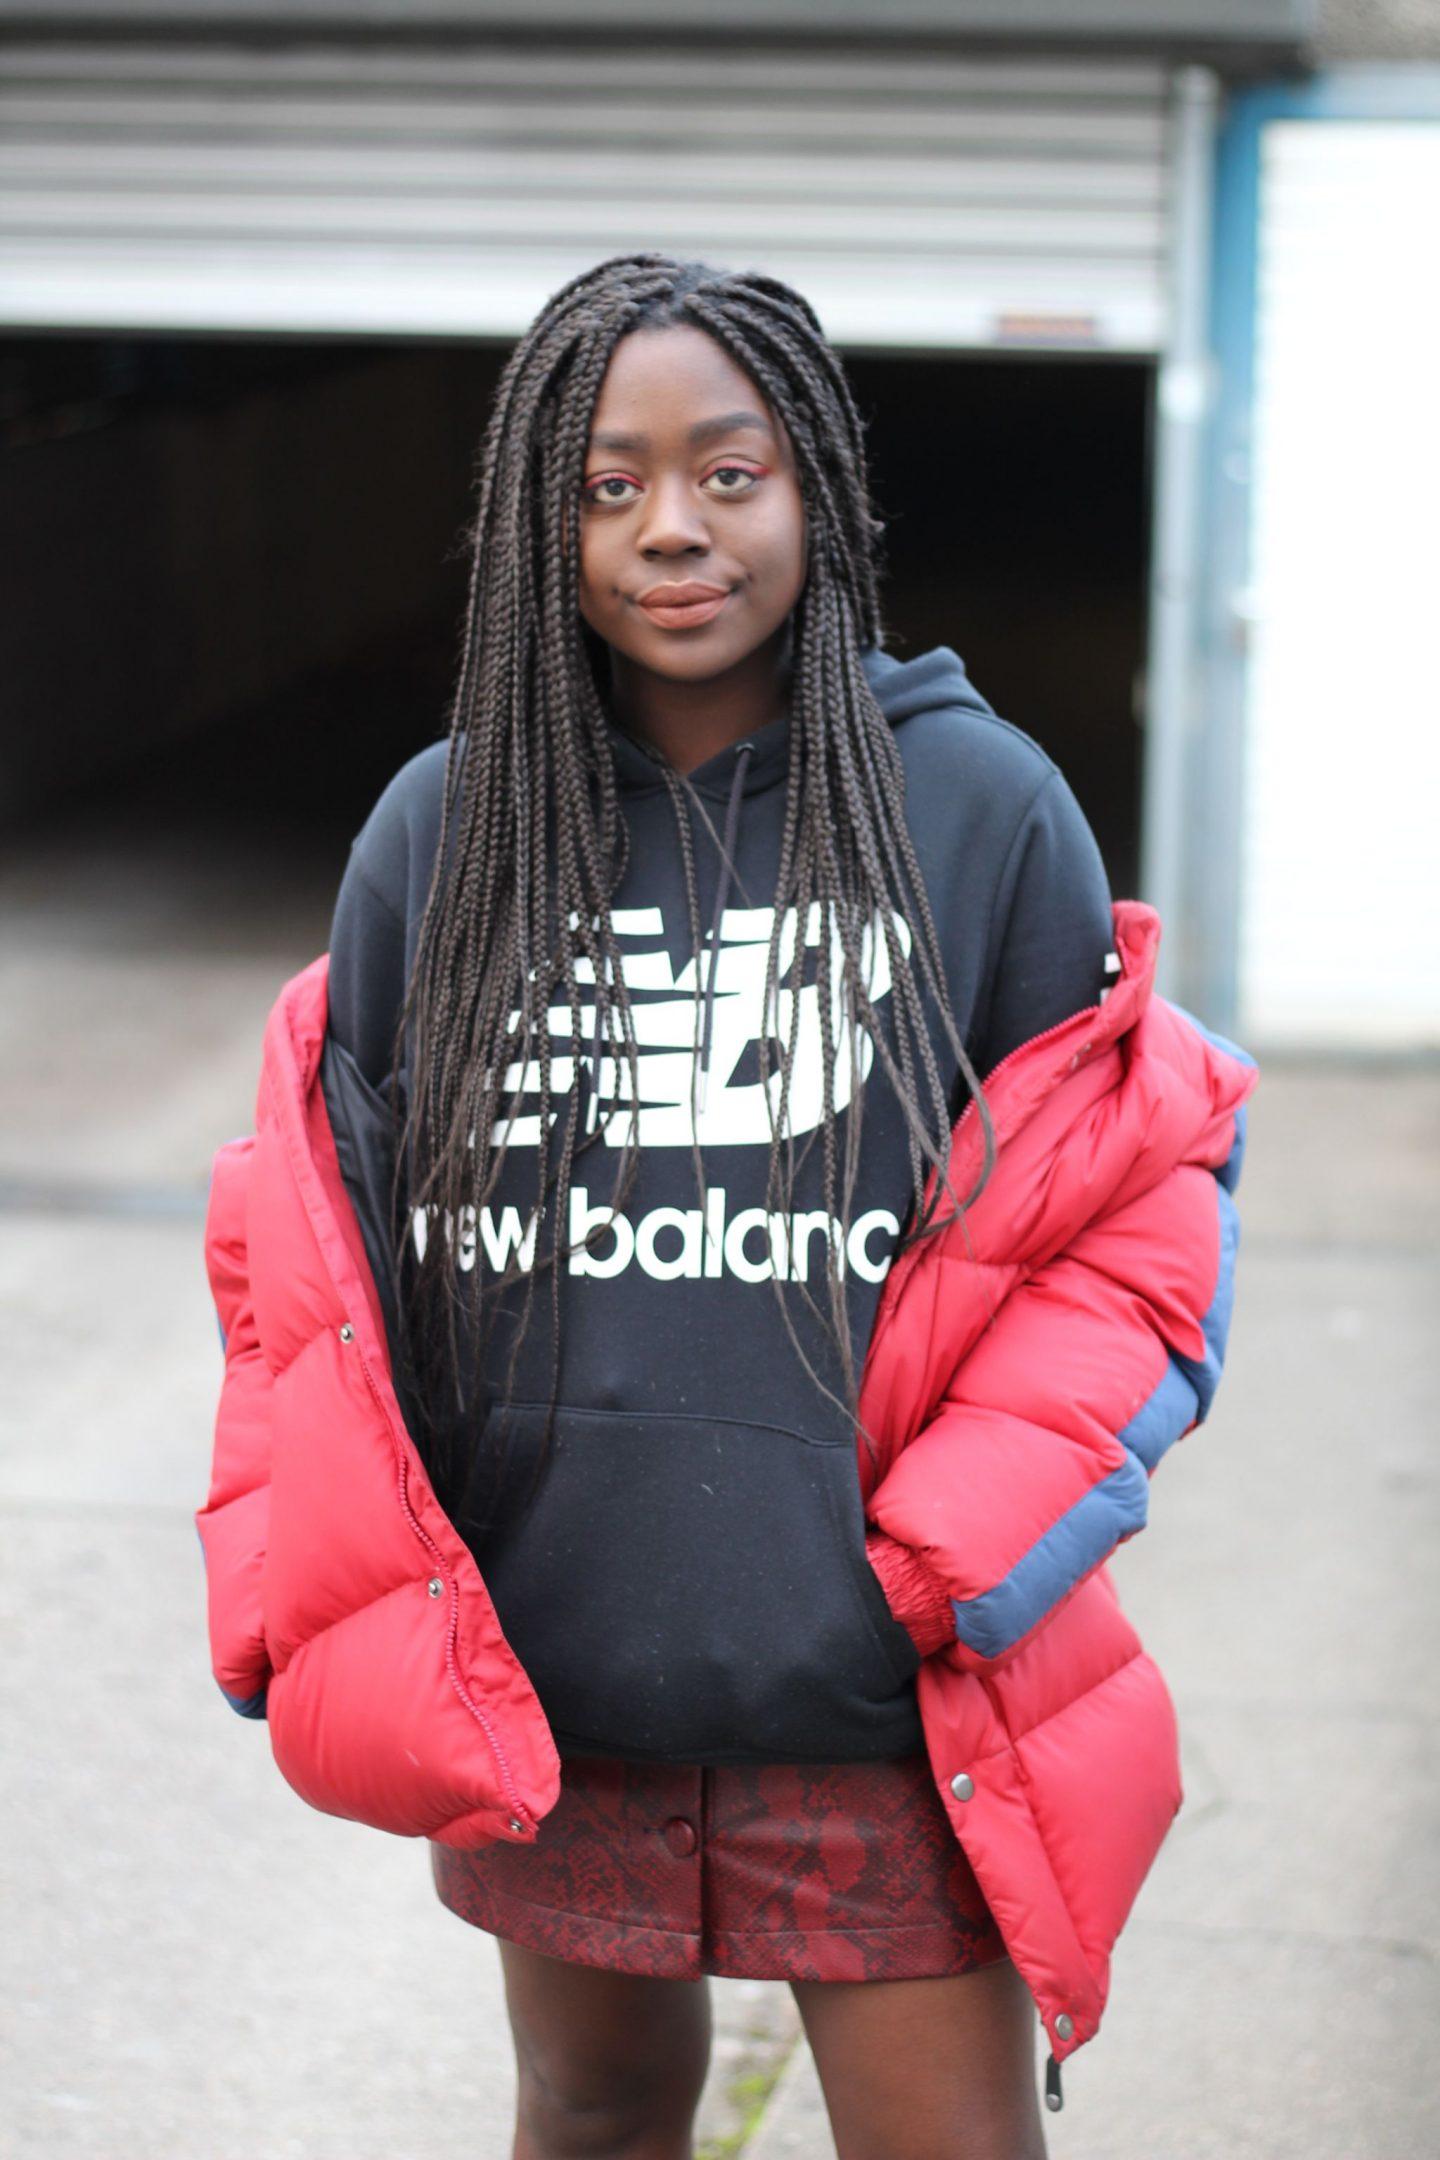 streetwear_chic_lois_opoku_fashion_blog_style_berlin_lisforlois_10